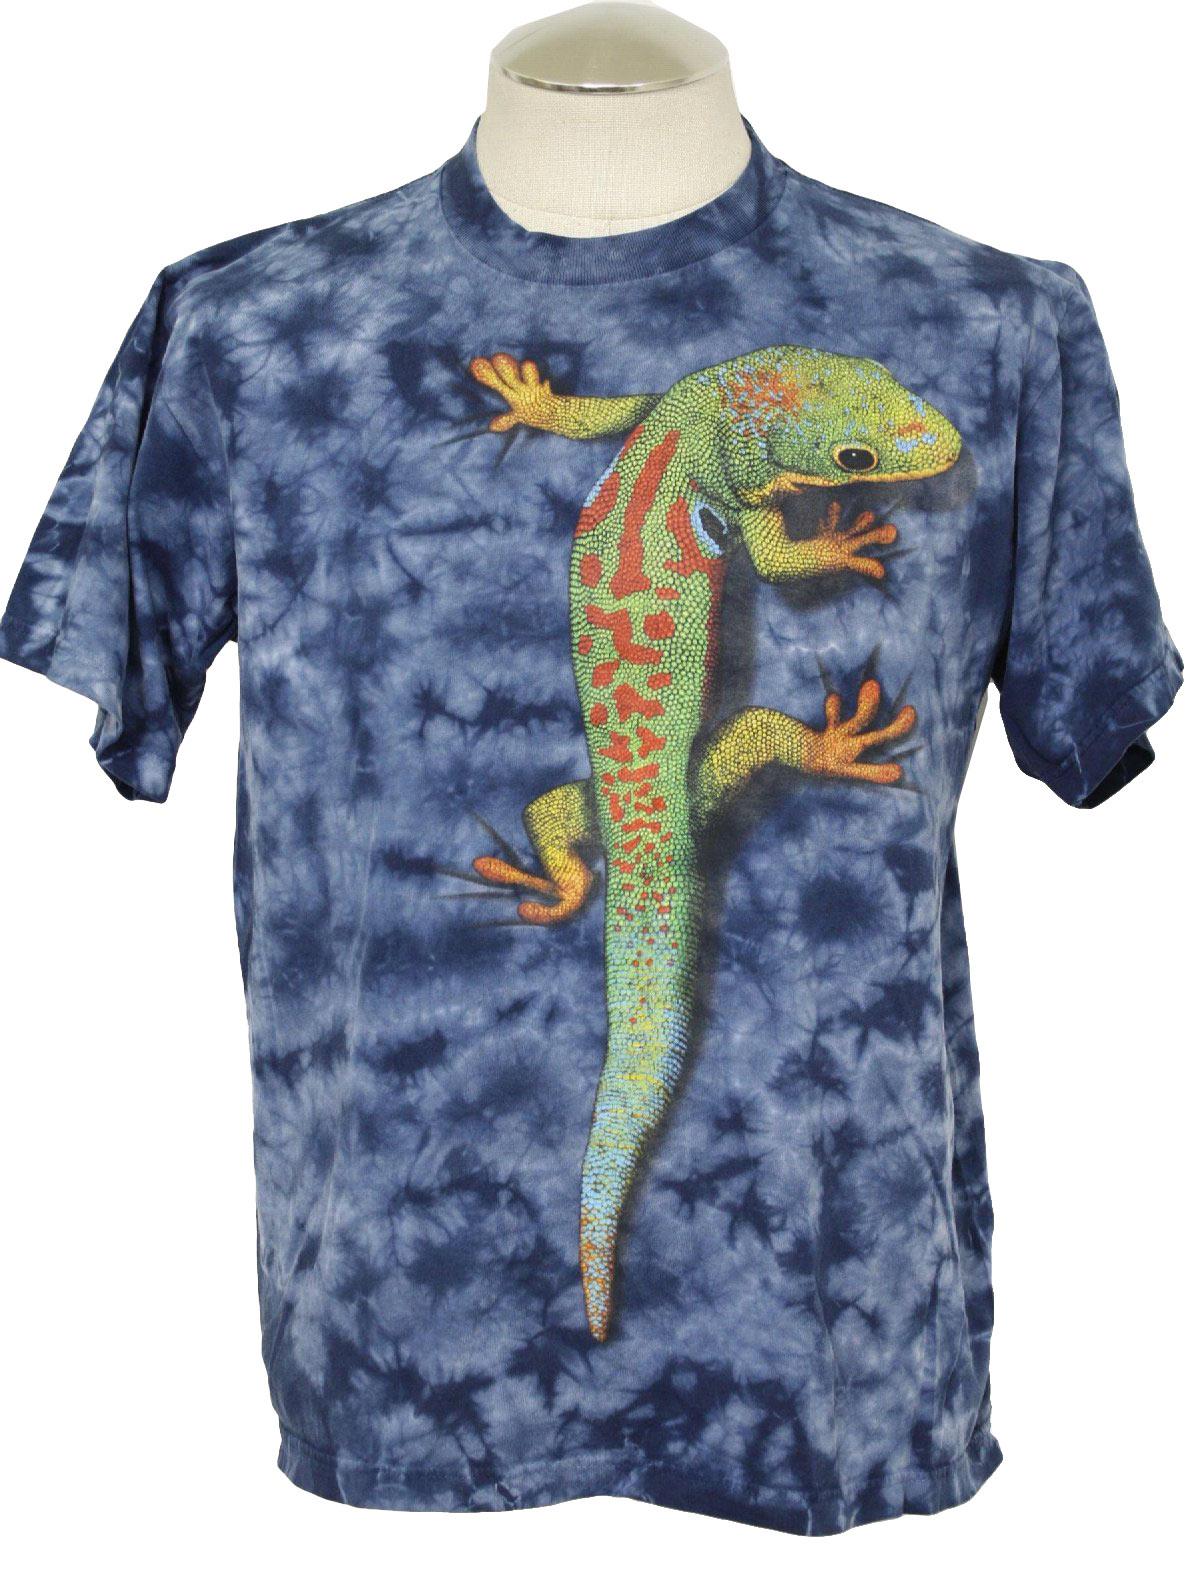 Rock+eagle+t+shirts